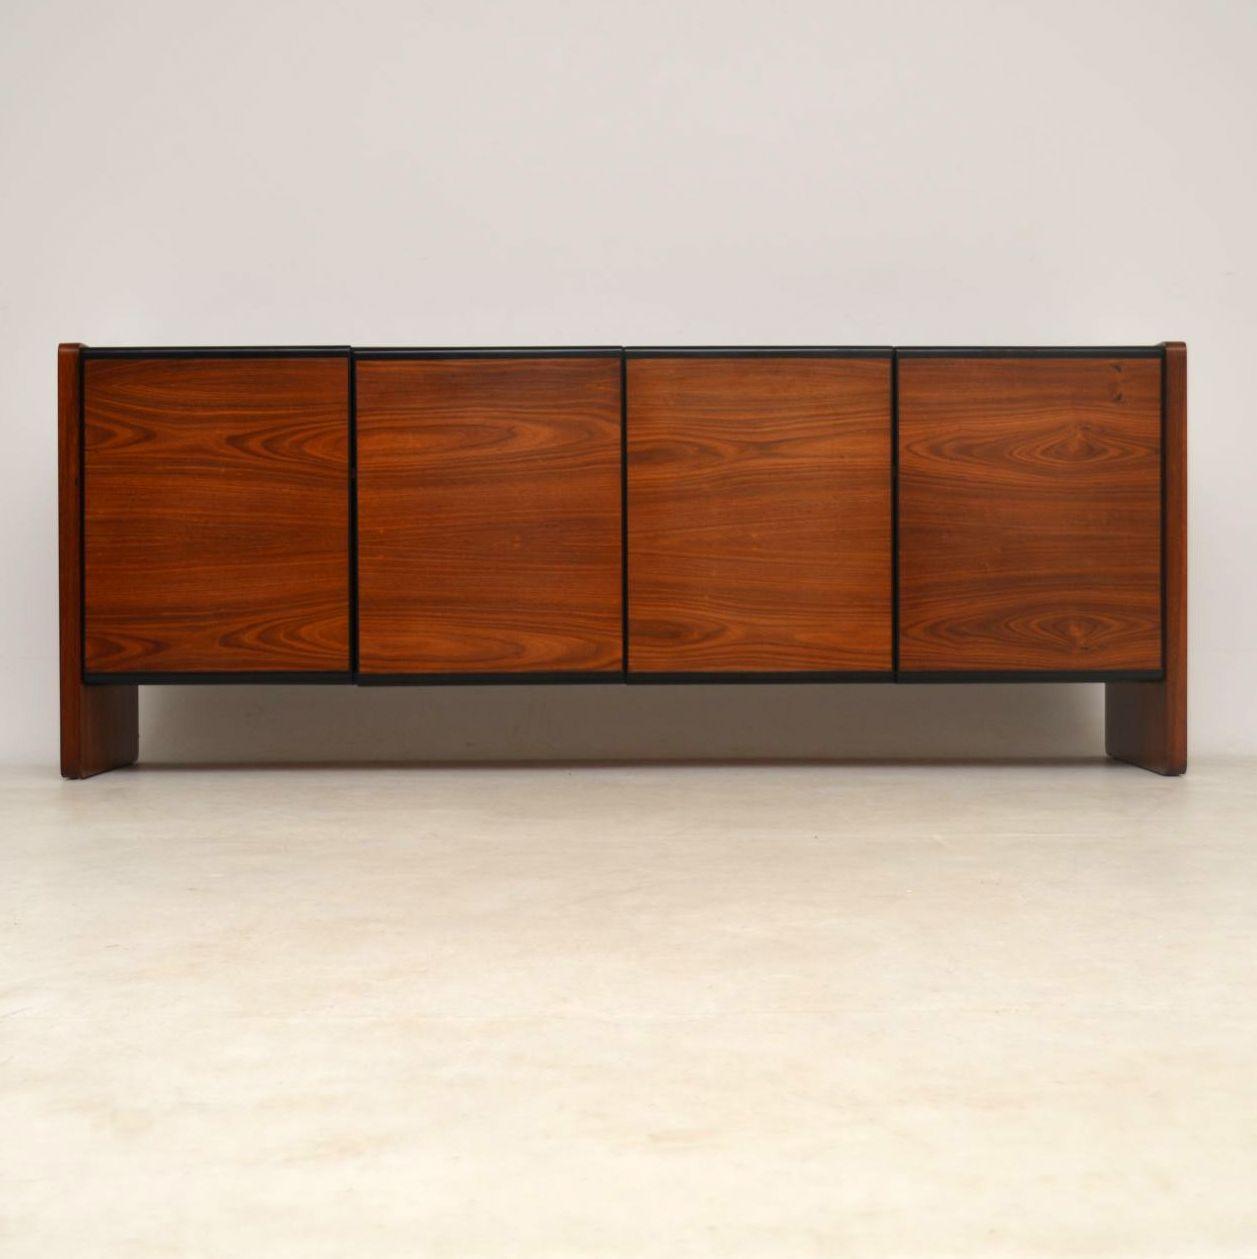 1960's Vintage Danish Rosewood Sideboard; 1960's Vintage Danish Rosewood  Sideboard ... - 1960's Vintage Danish Rosewood Sideboard Retrospective Interiors